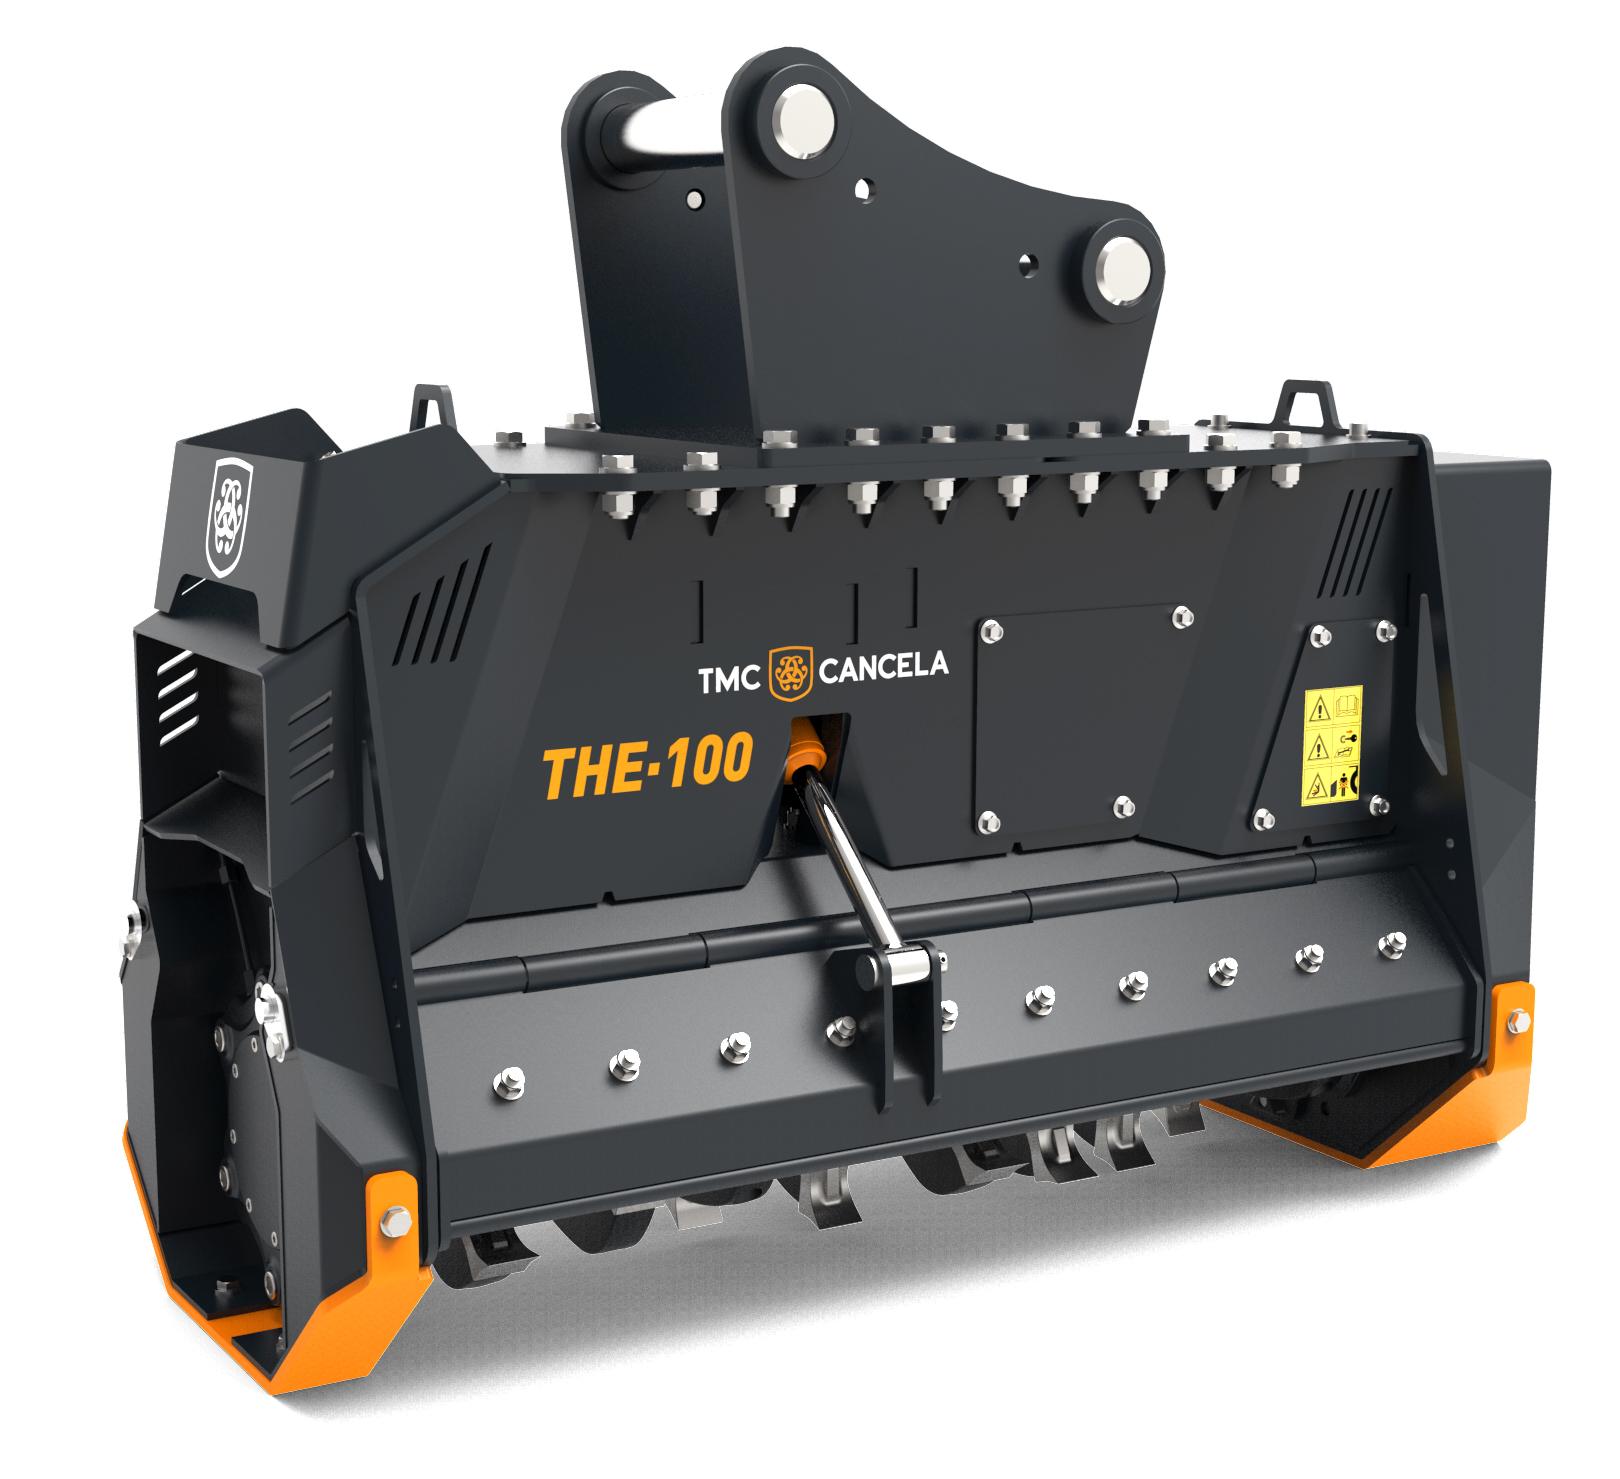 THE 1 Trinciatrice Trincia Trituradora Triturador Hidraulica